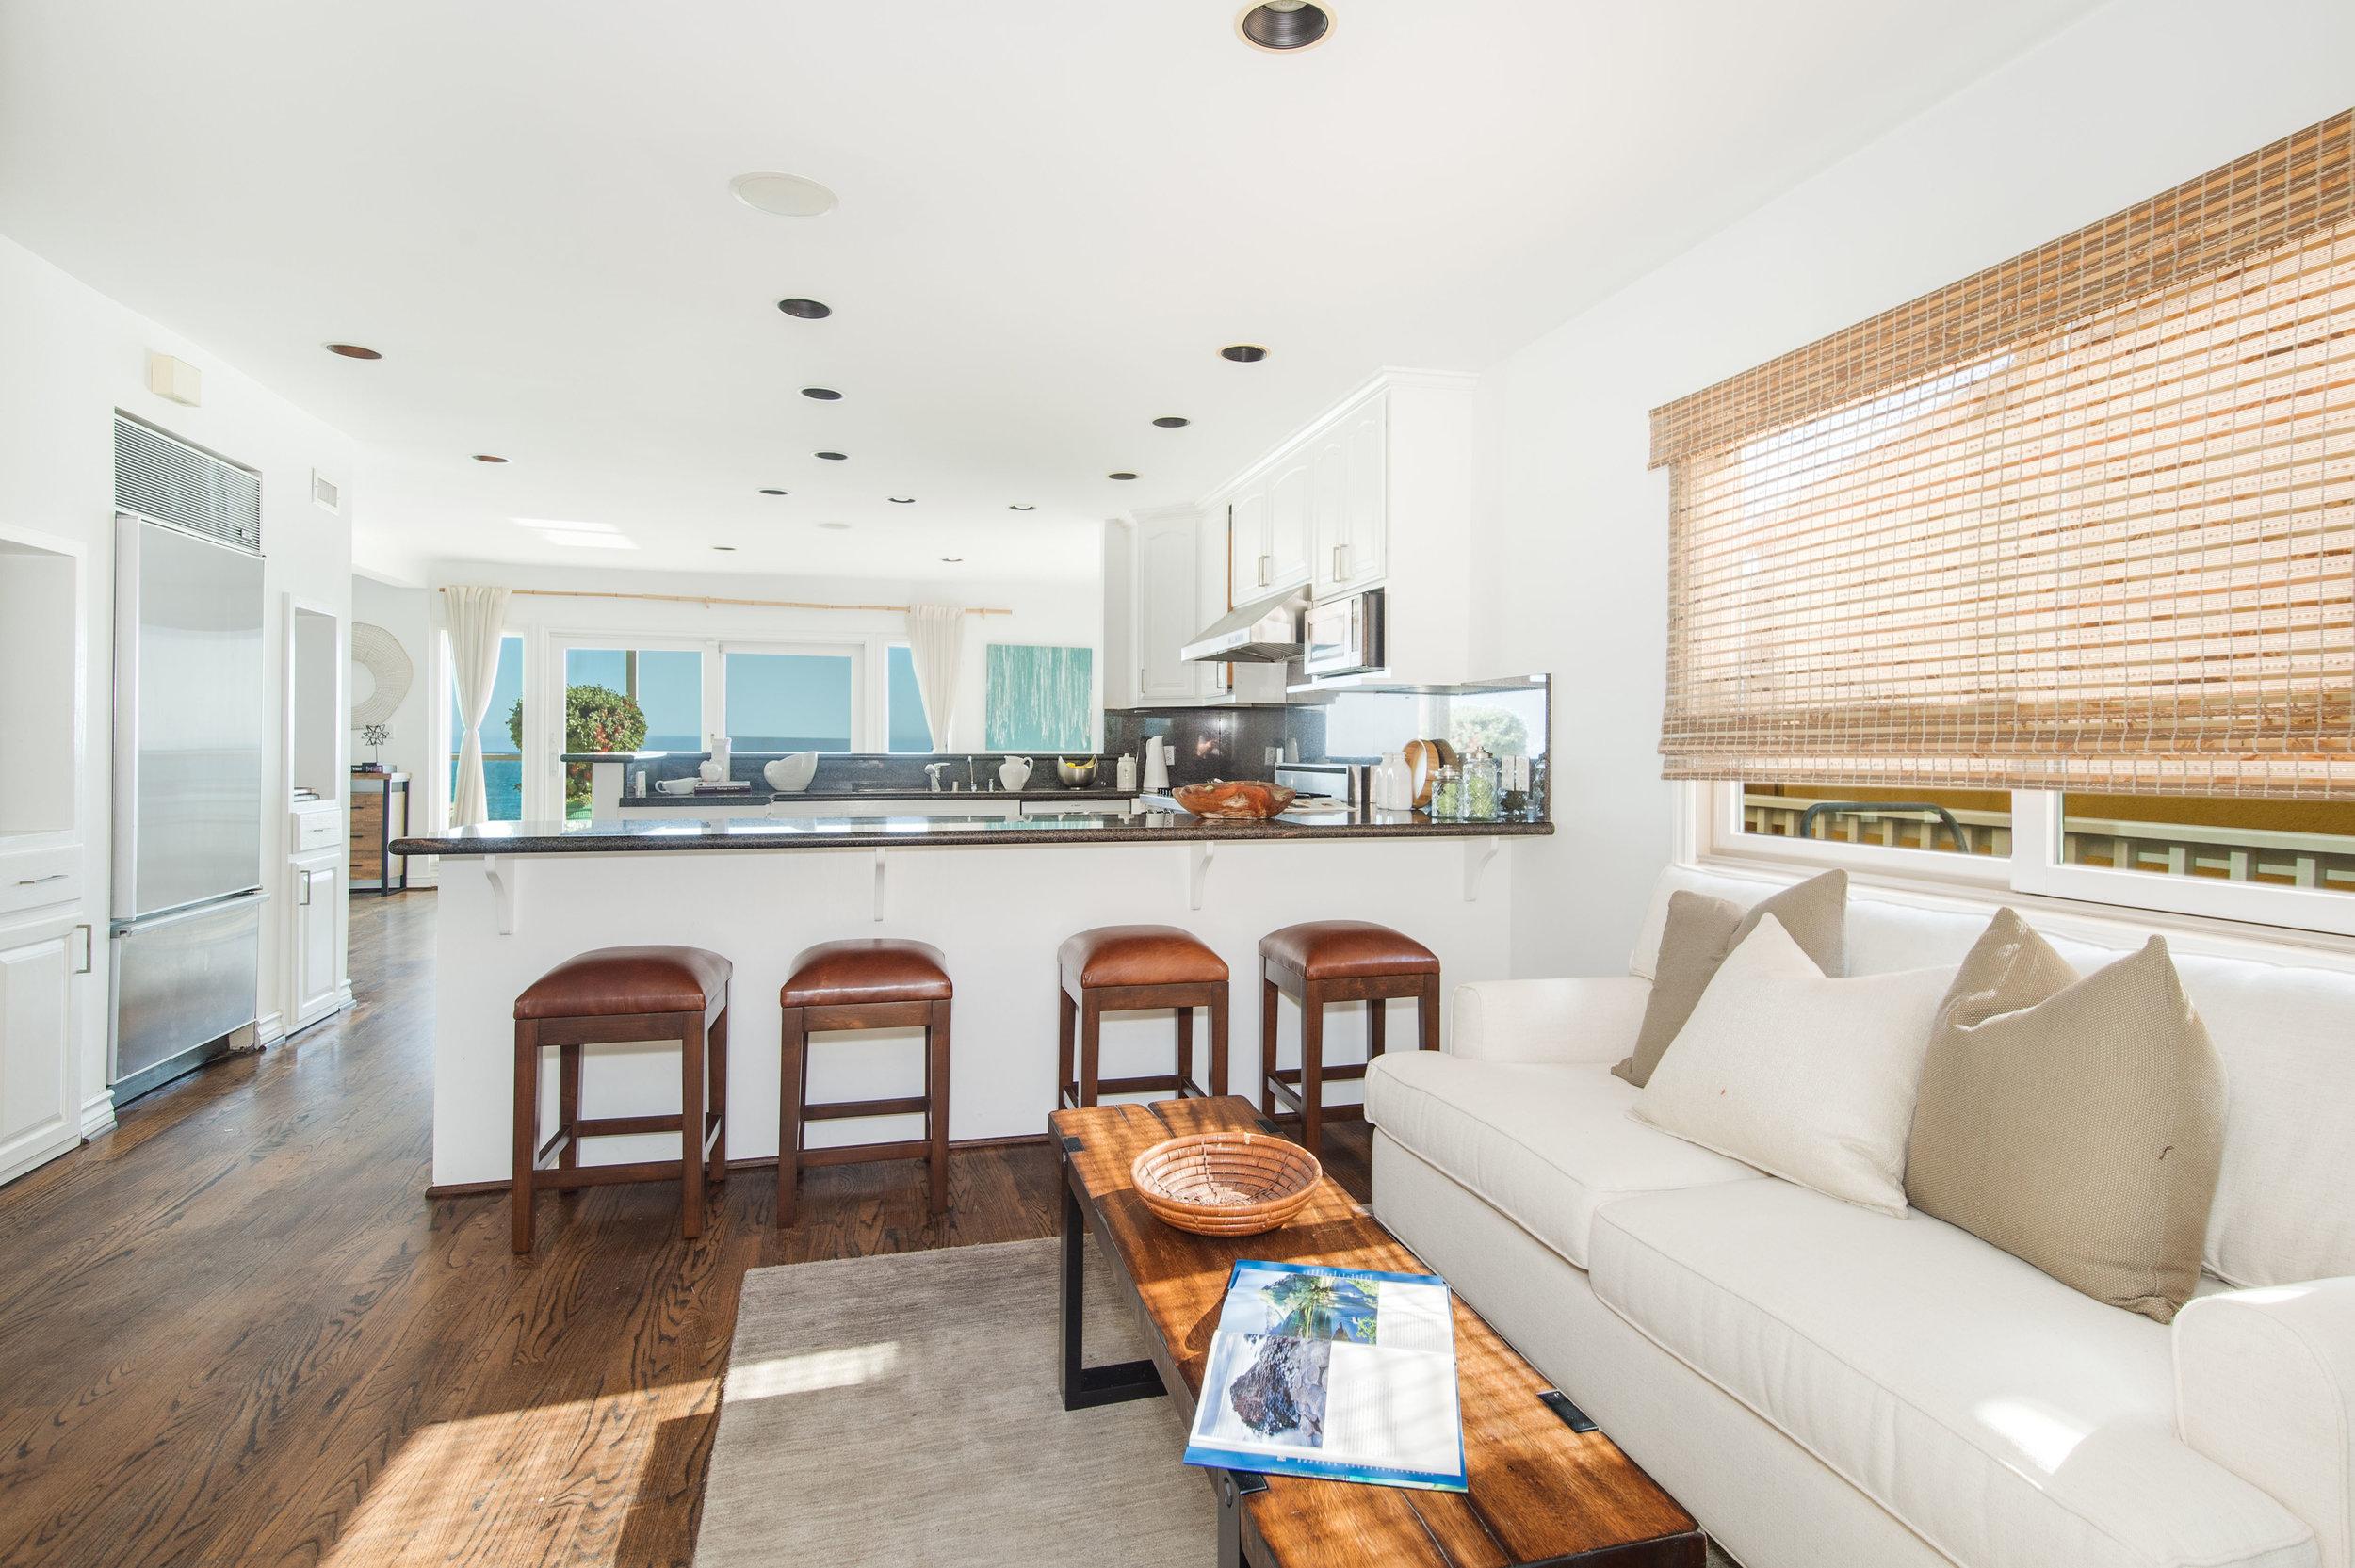 010 Kitchen 25342 Malibu Road For Sale Lease The Malibu Life Team Luxury Real Estate.jpg